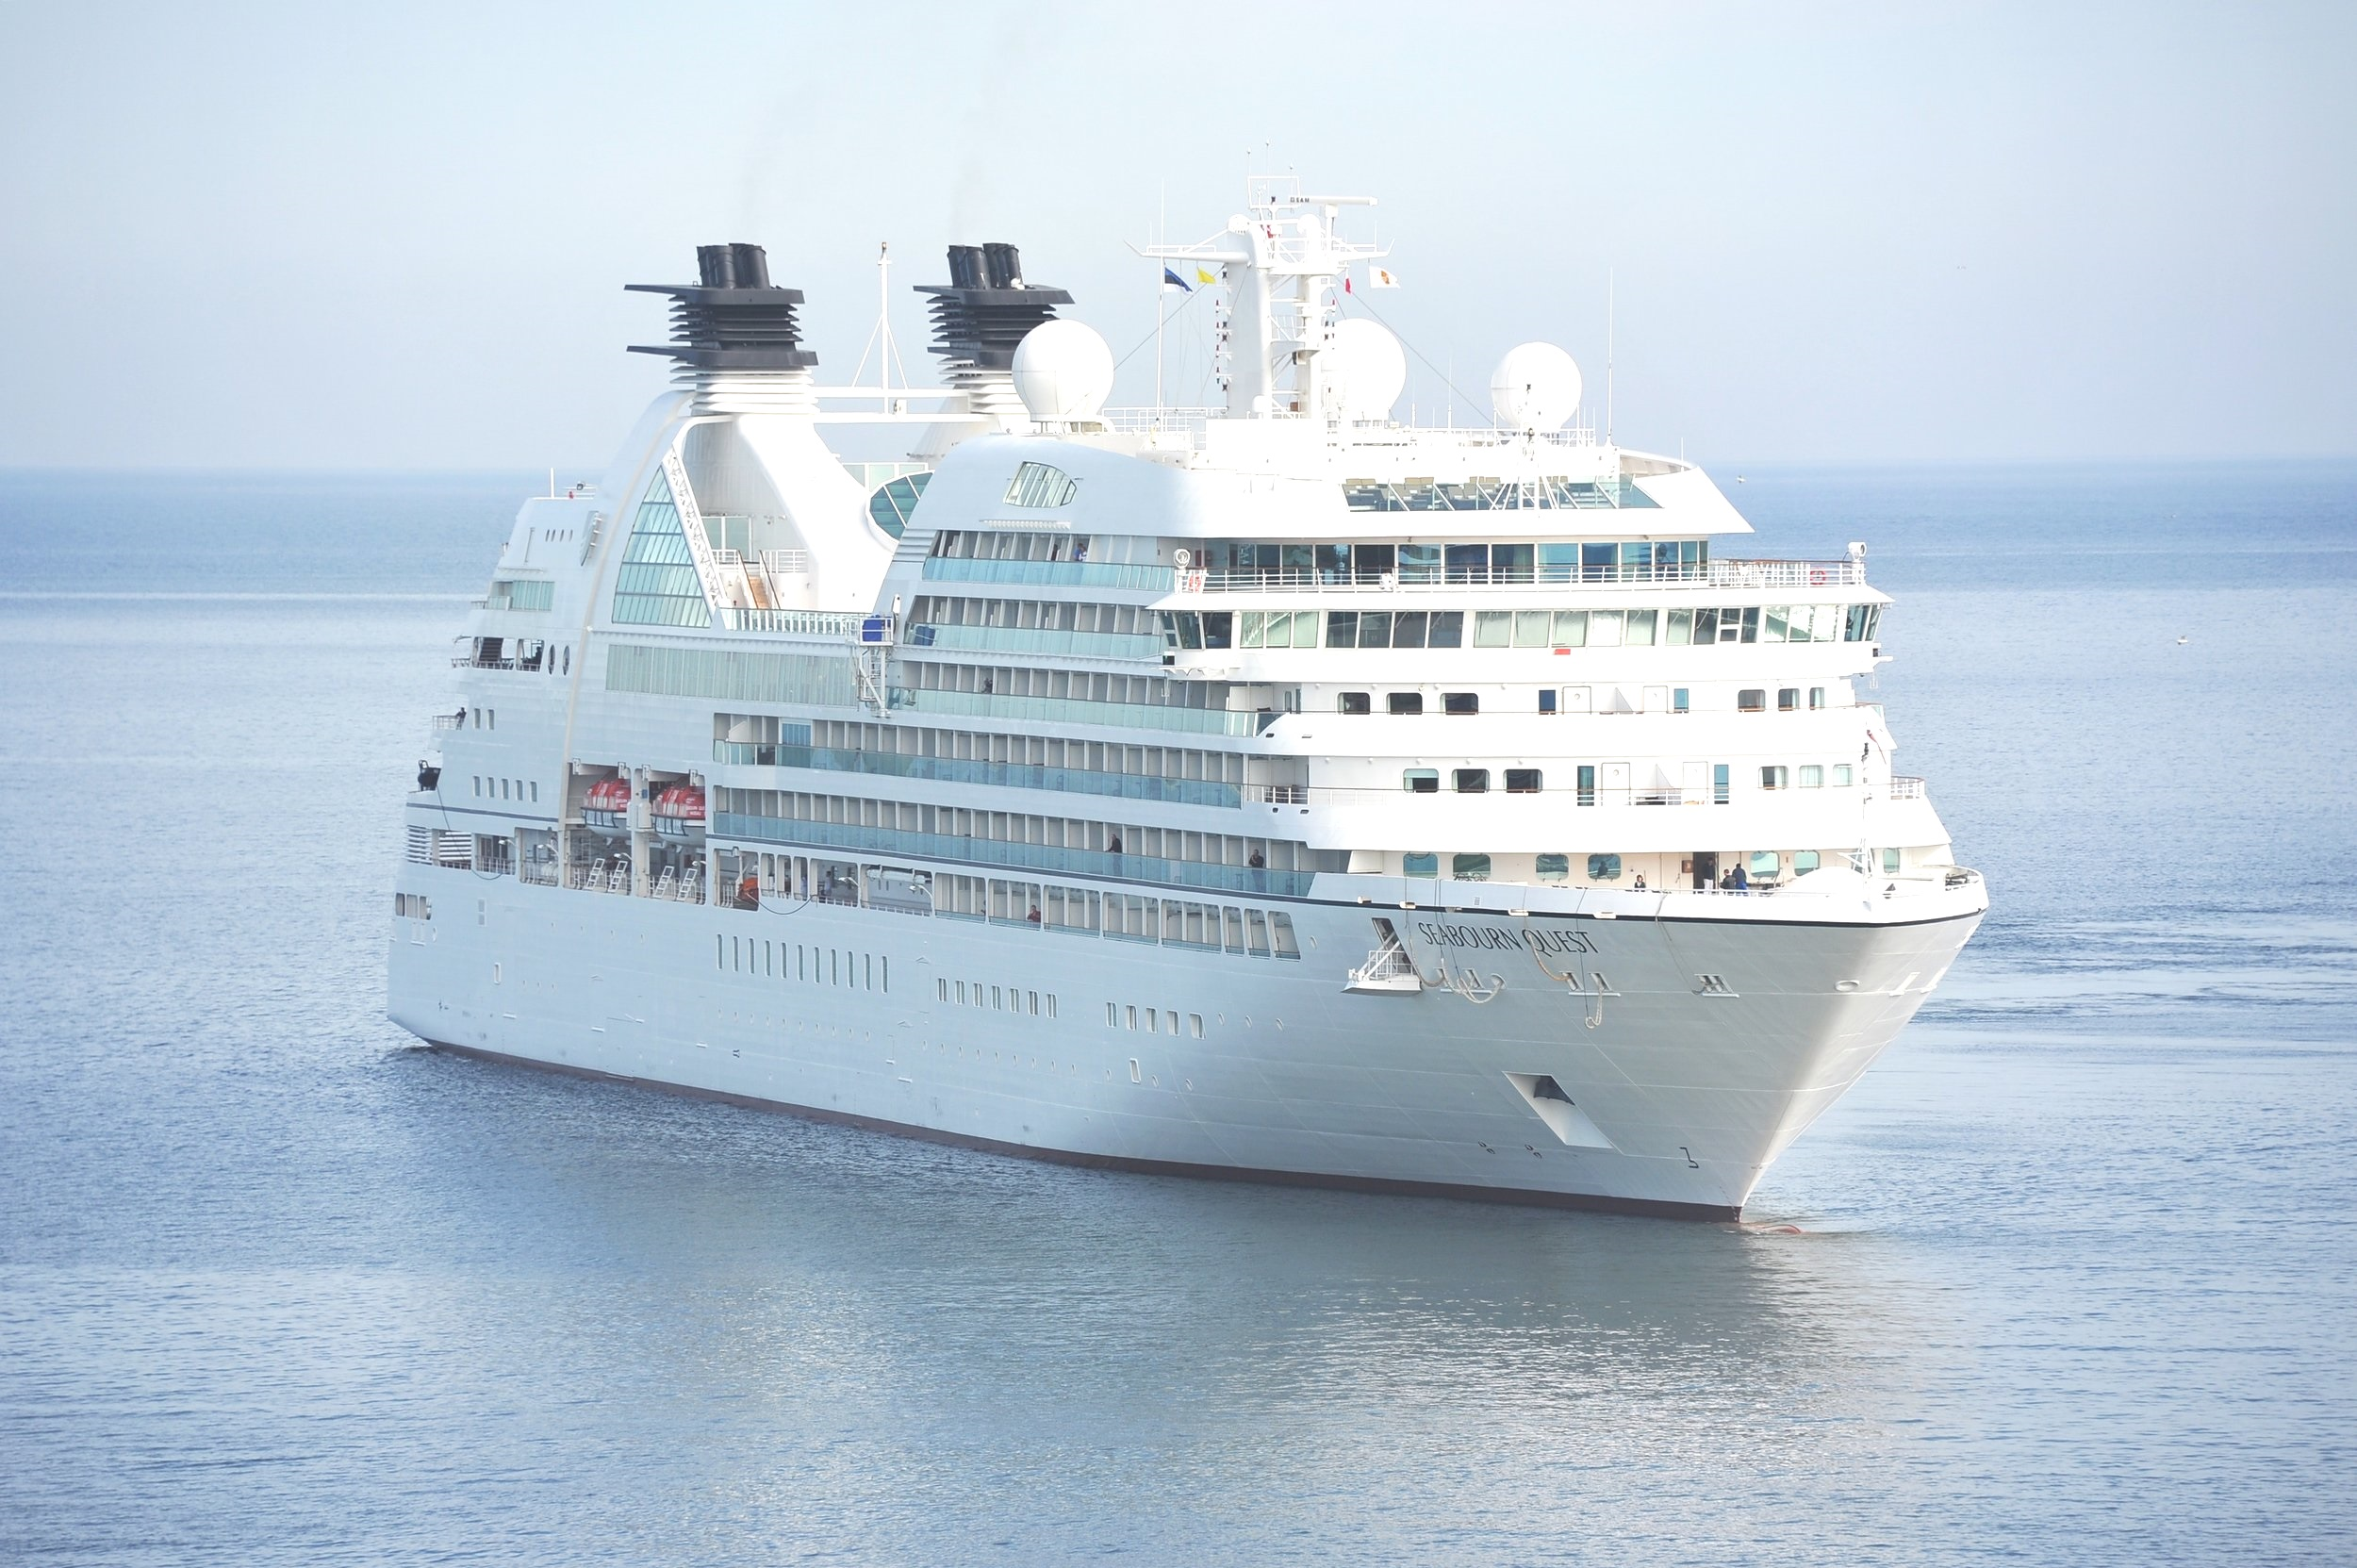 cruise-cruise-ship-ocean-144237.jpg